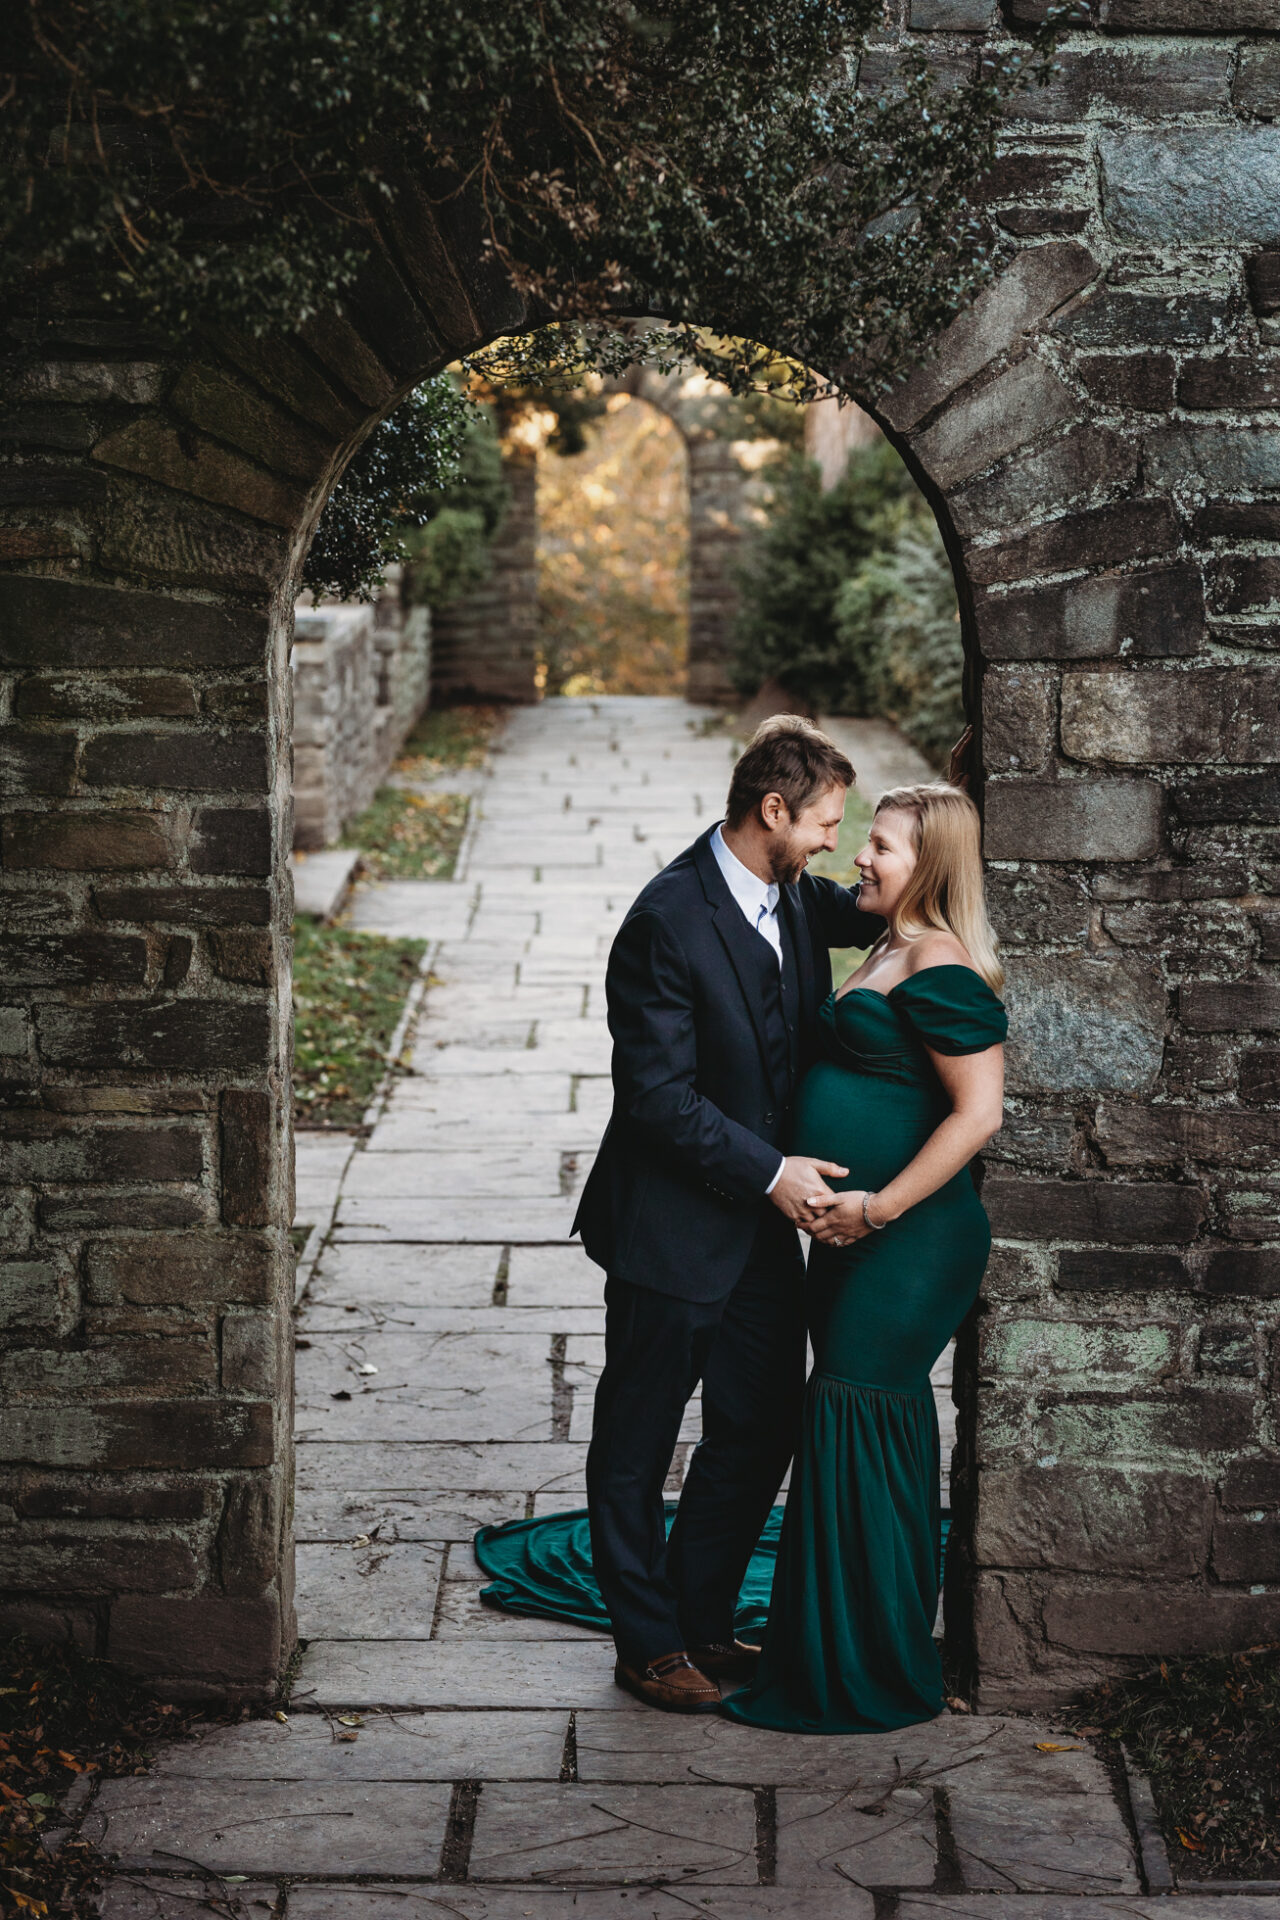 glamorous outdoor maternity photo pregnancy emerald green dress